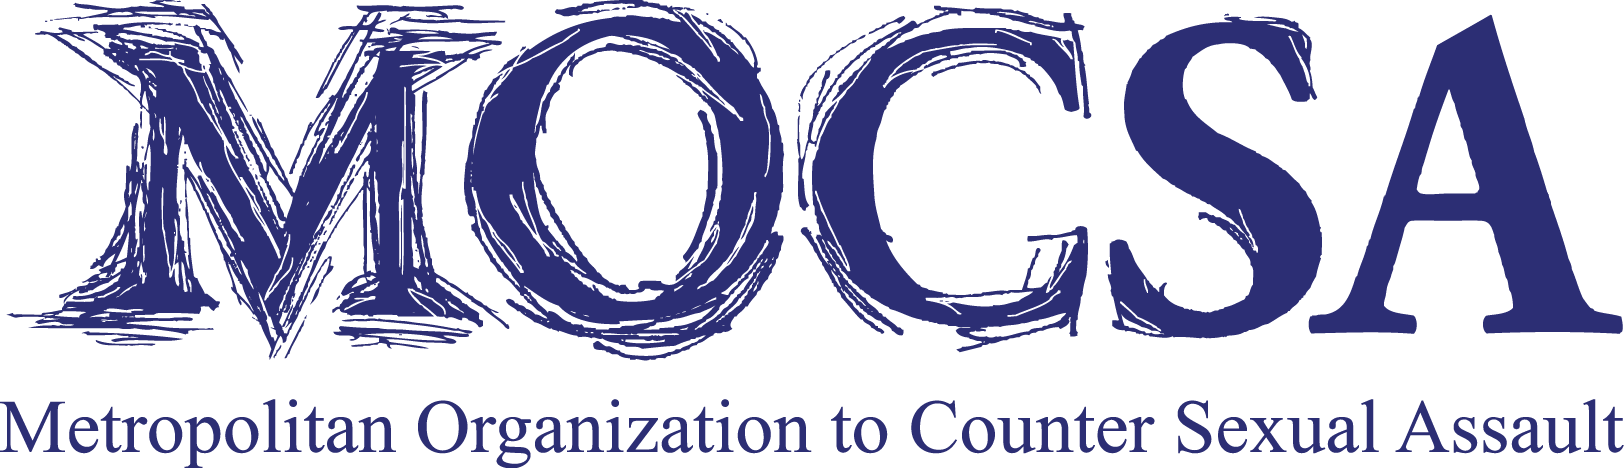 MOCSA_blue_logo.png